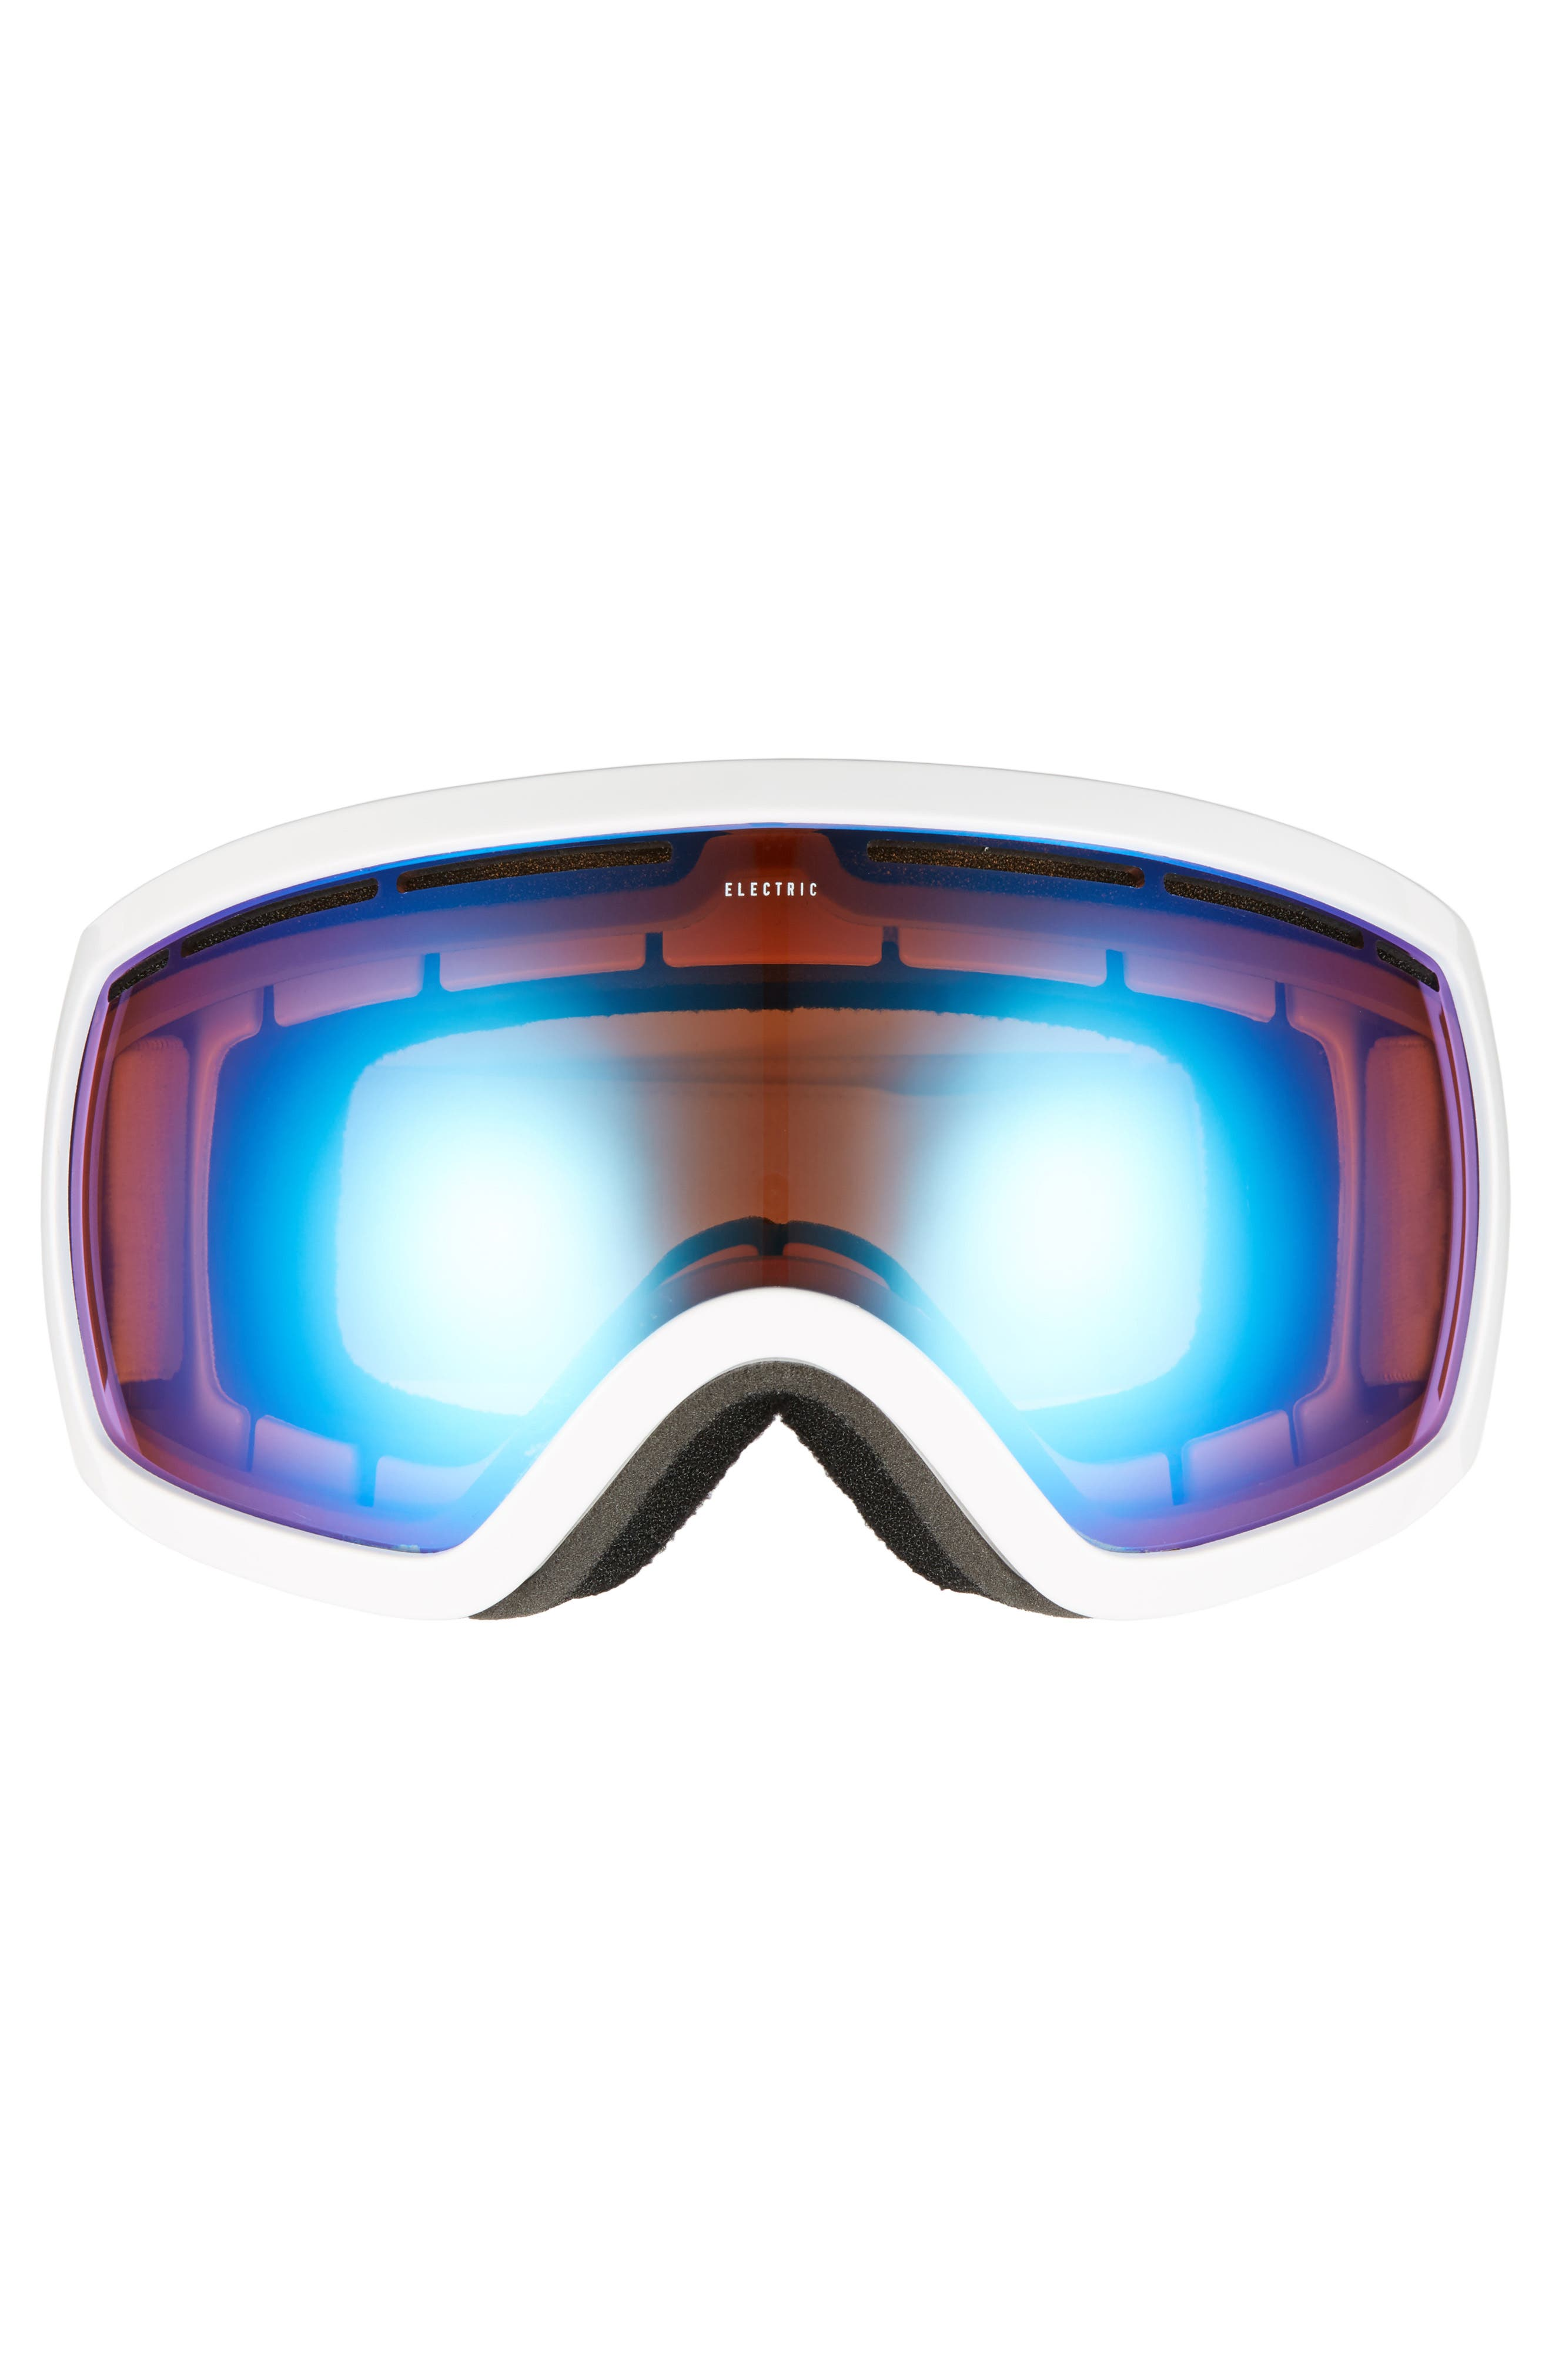 EG2.5 Snow Goggles,                             Alternate thumbnail 14, color,